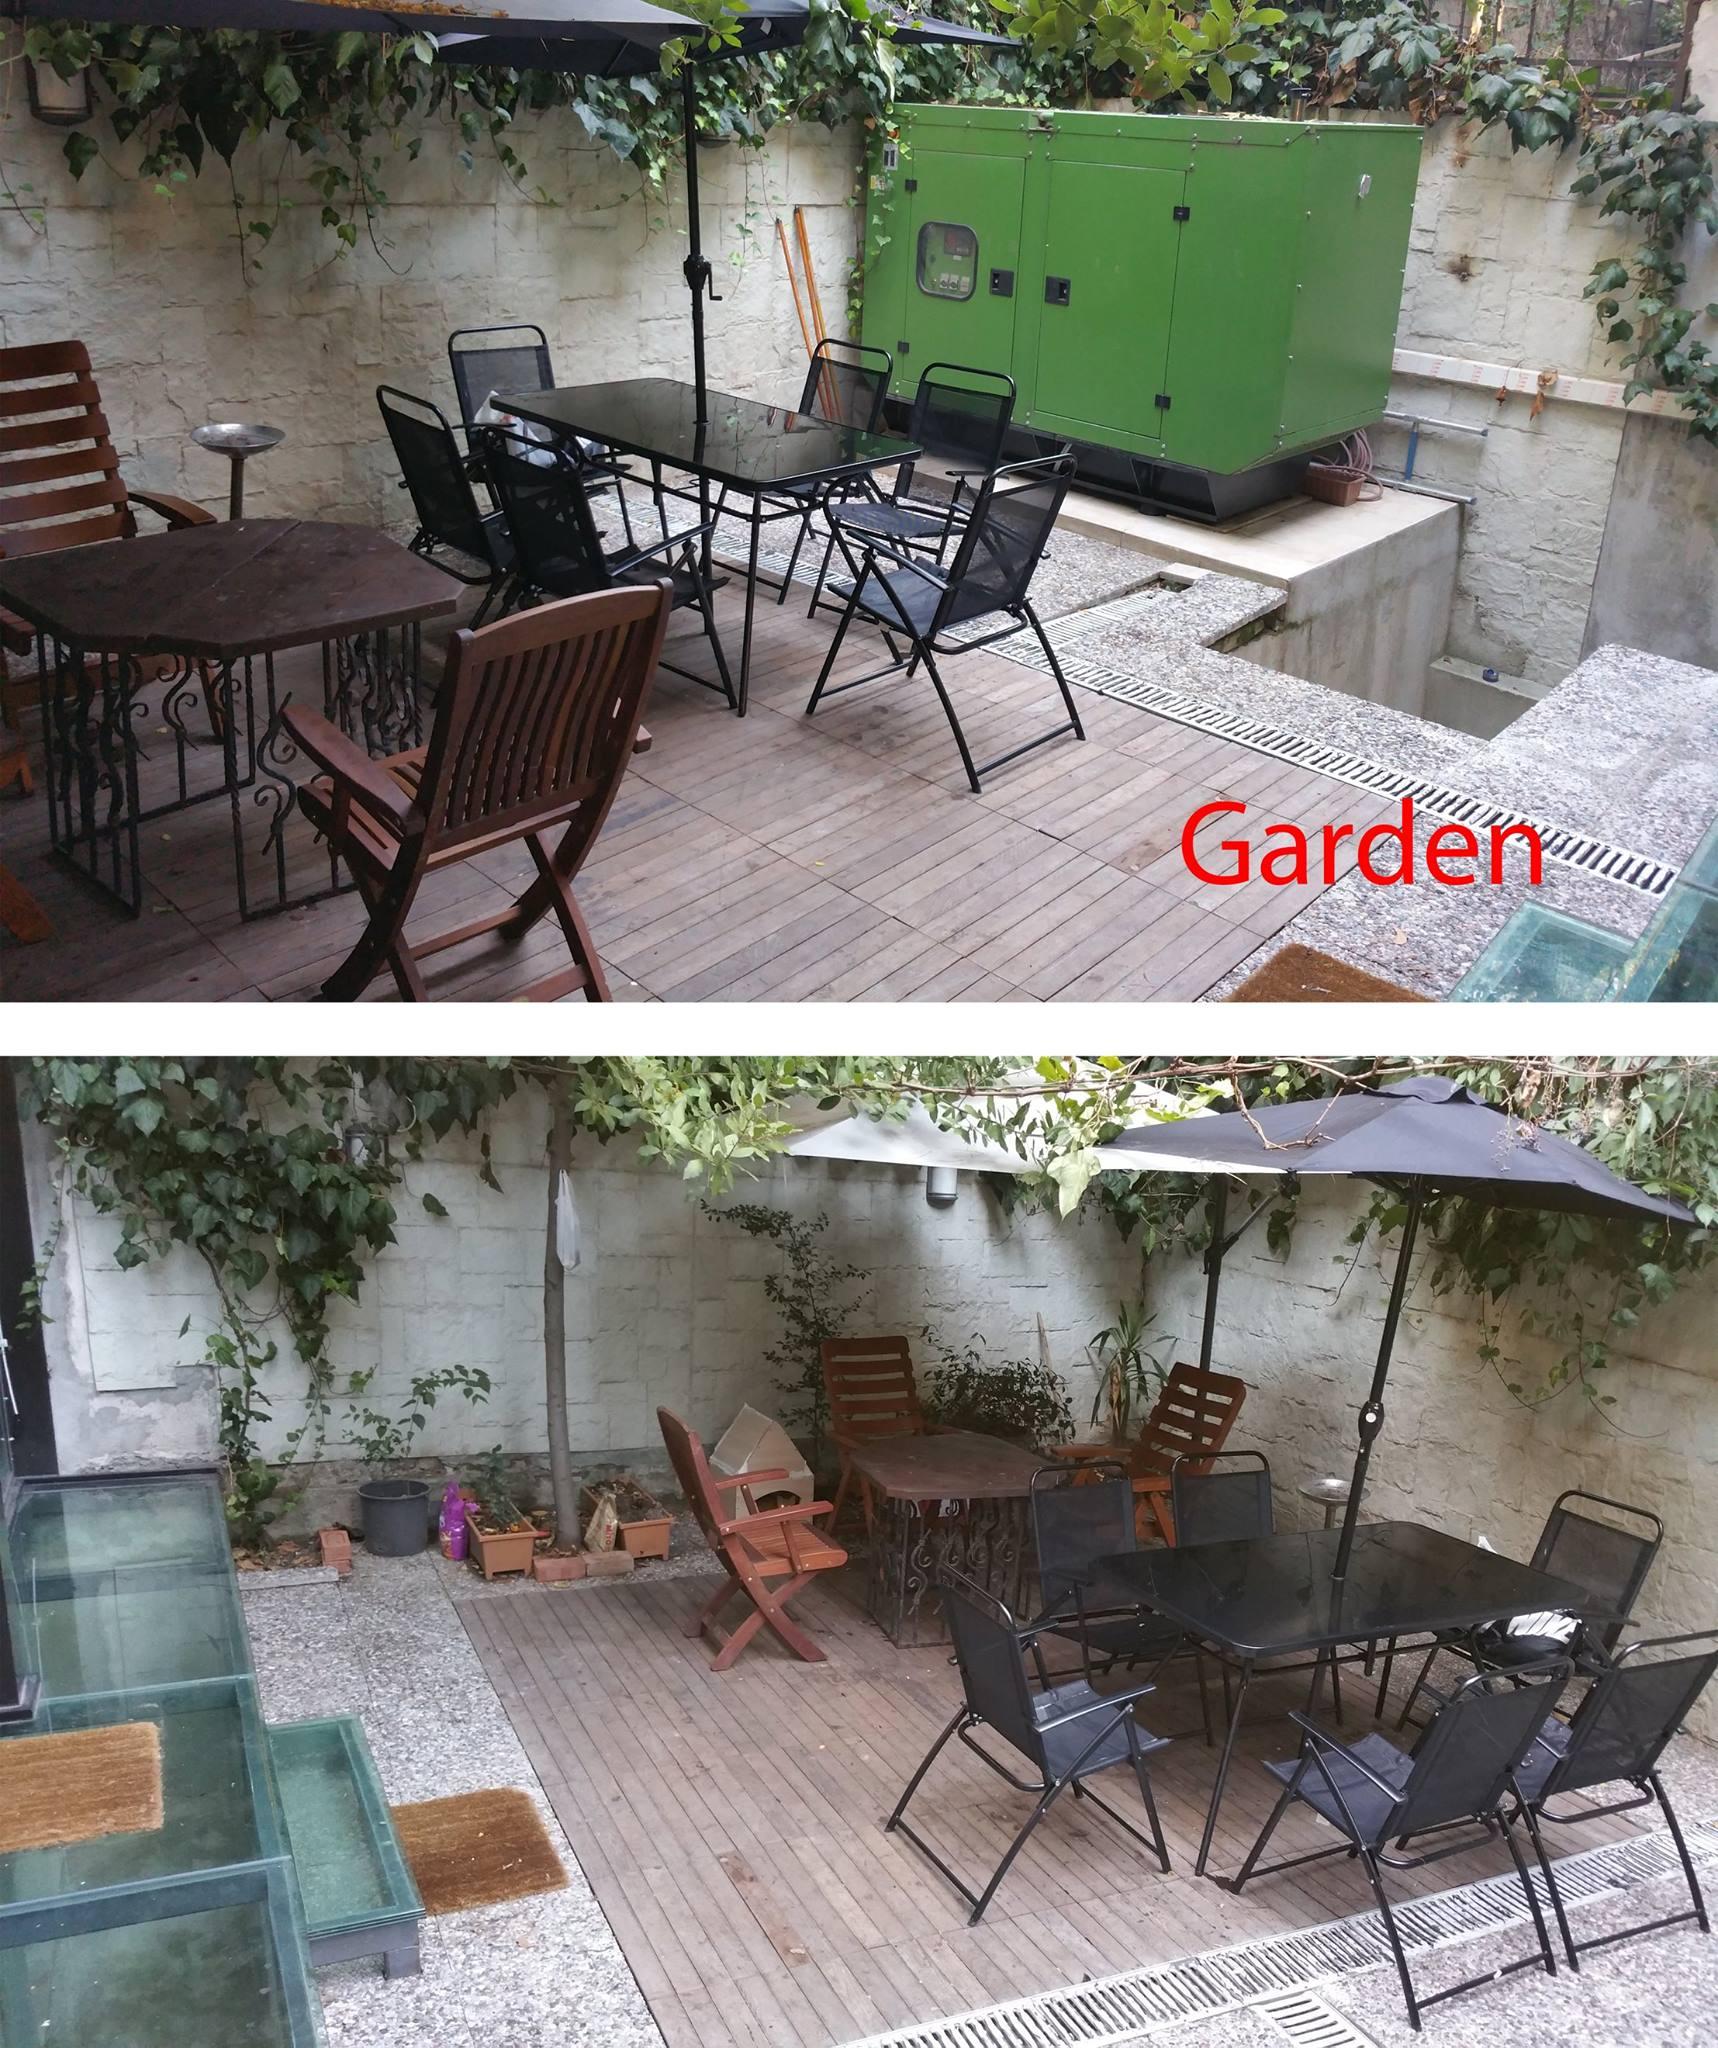 Roncalli Building Gardeng